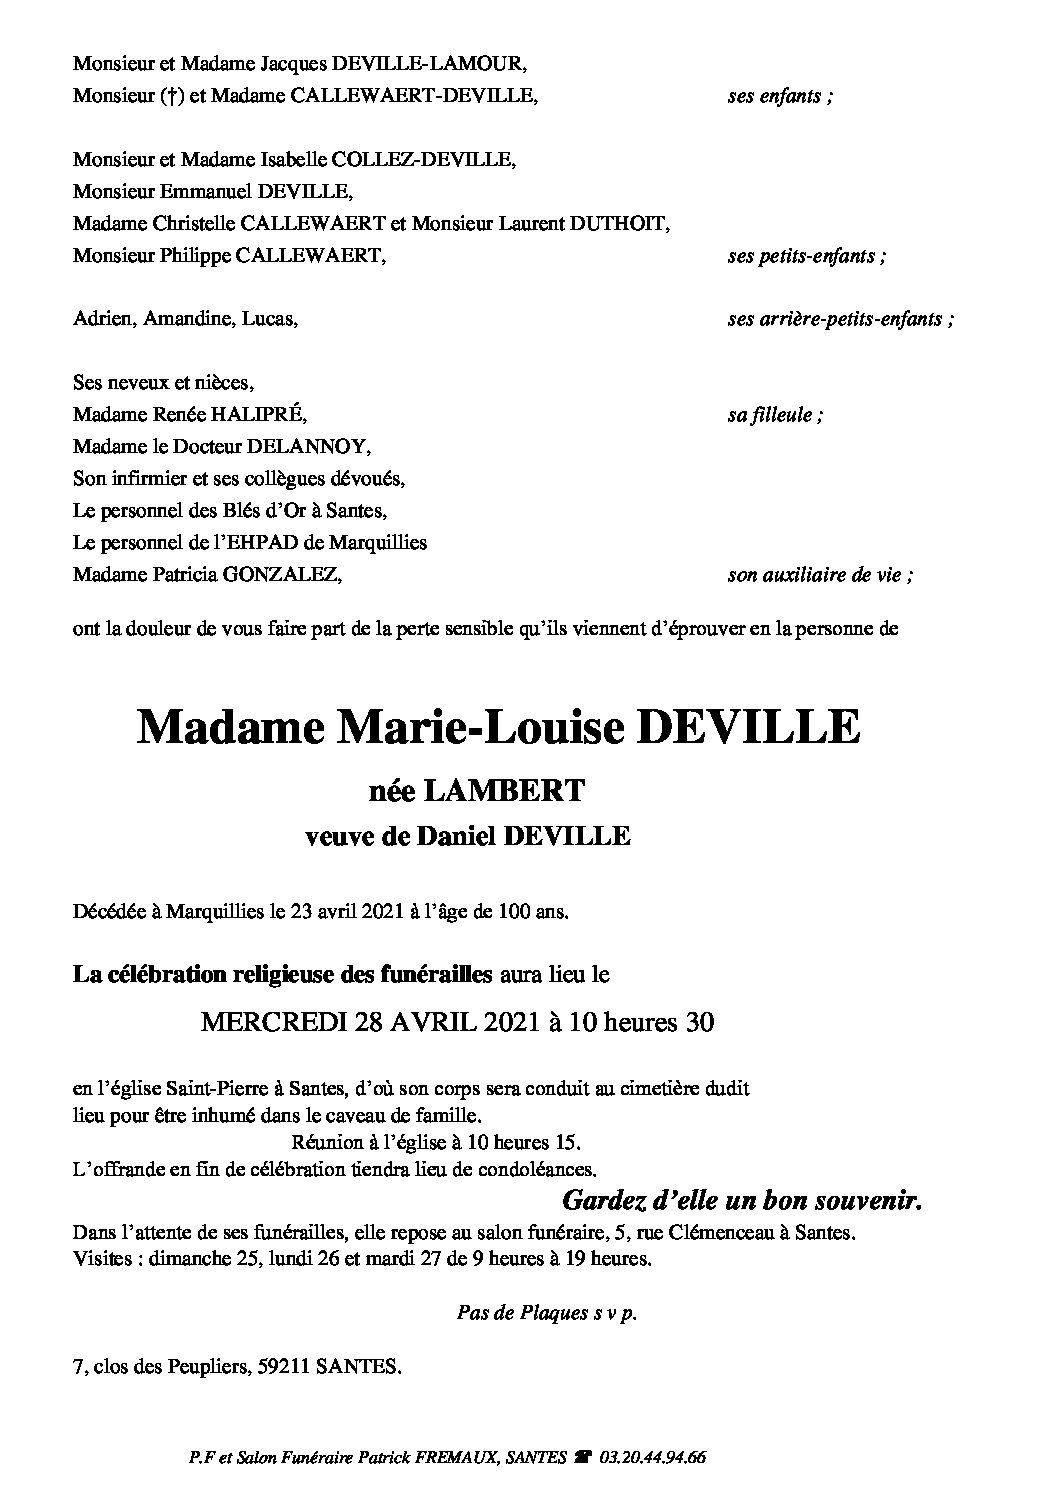 Madame Marie-Louise DEVILLE née LAMBERT